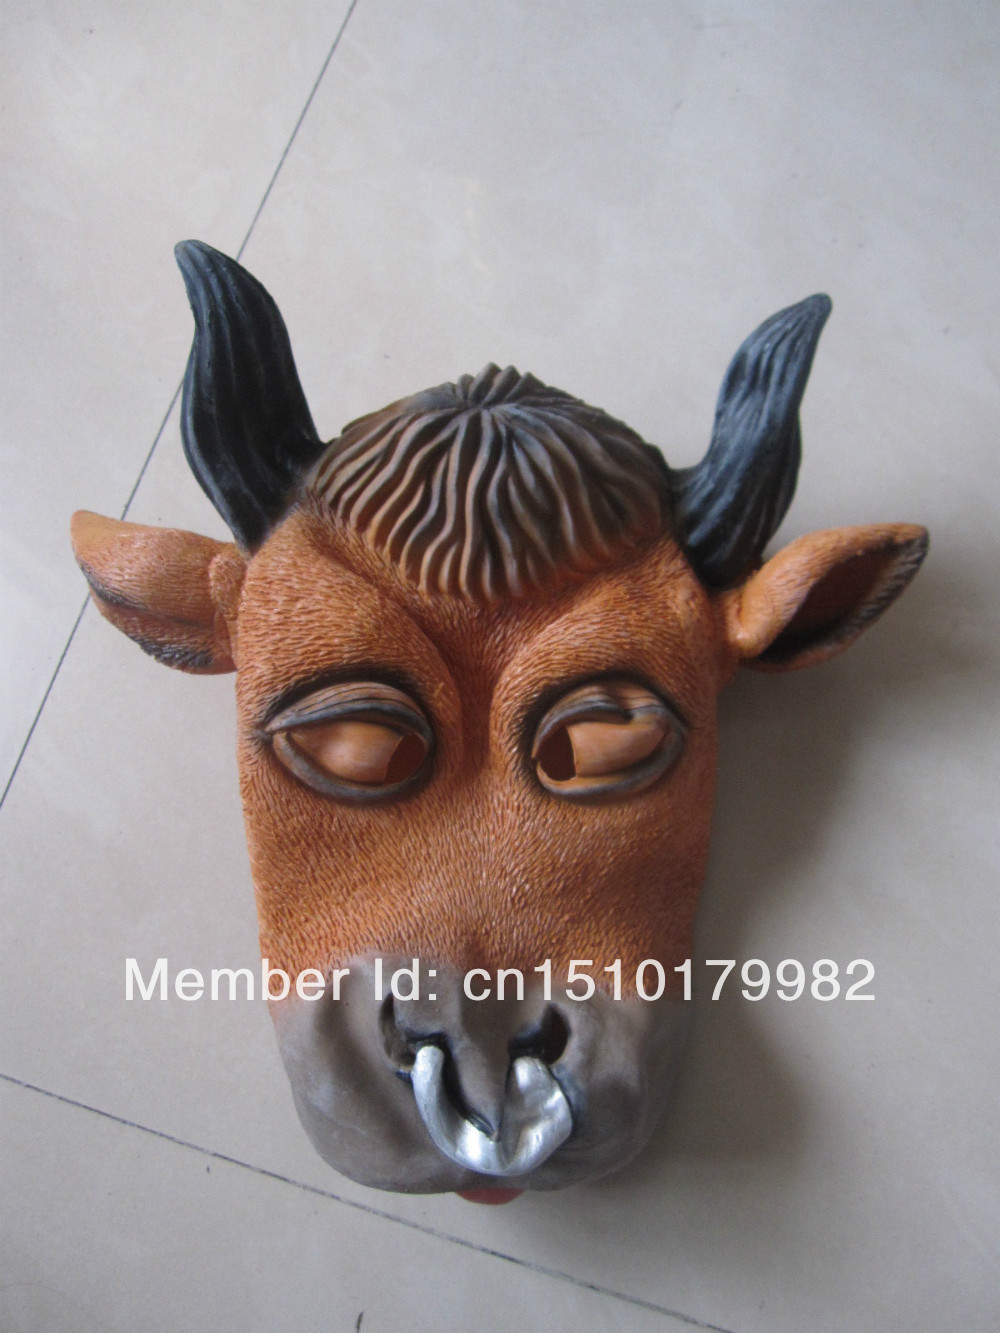 Sensitive Face Mask Mask Full Face Animal Mask